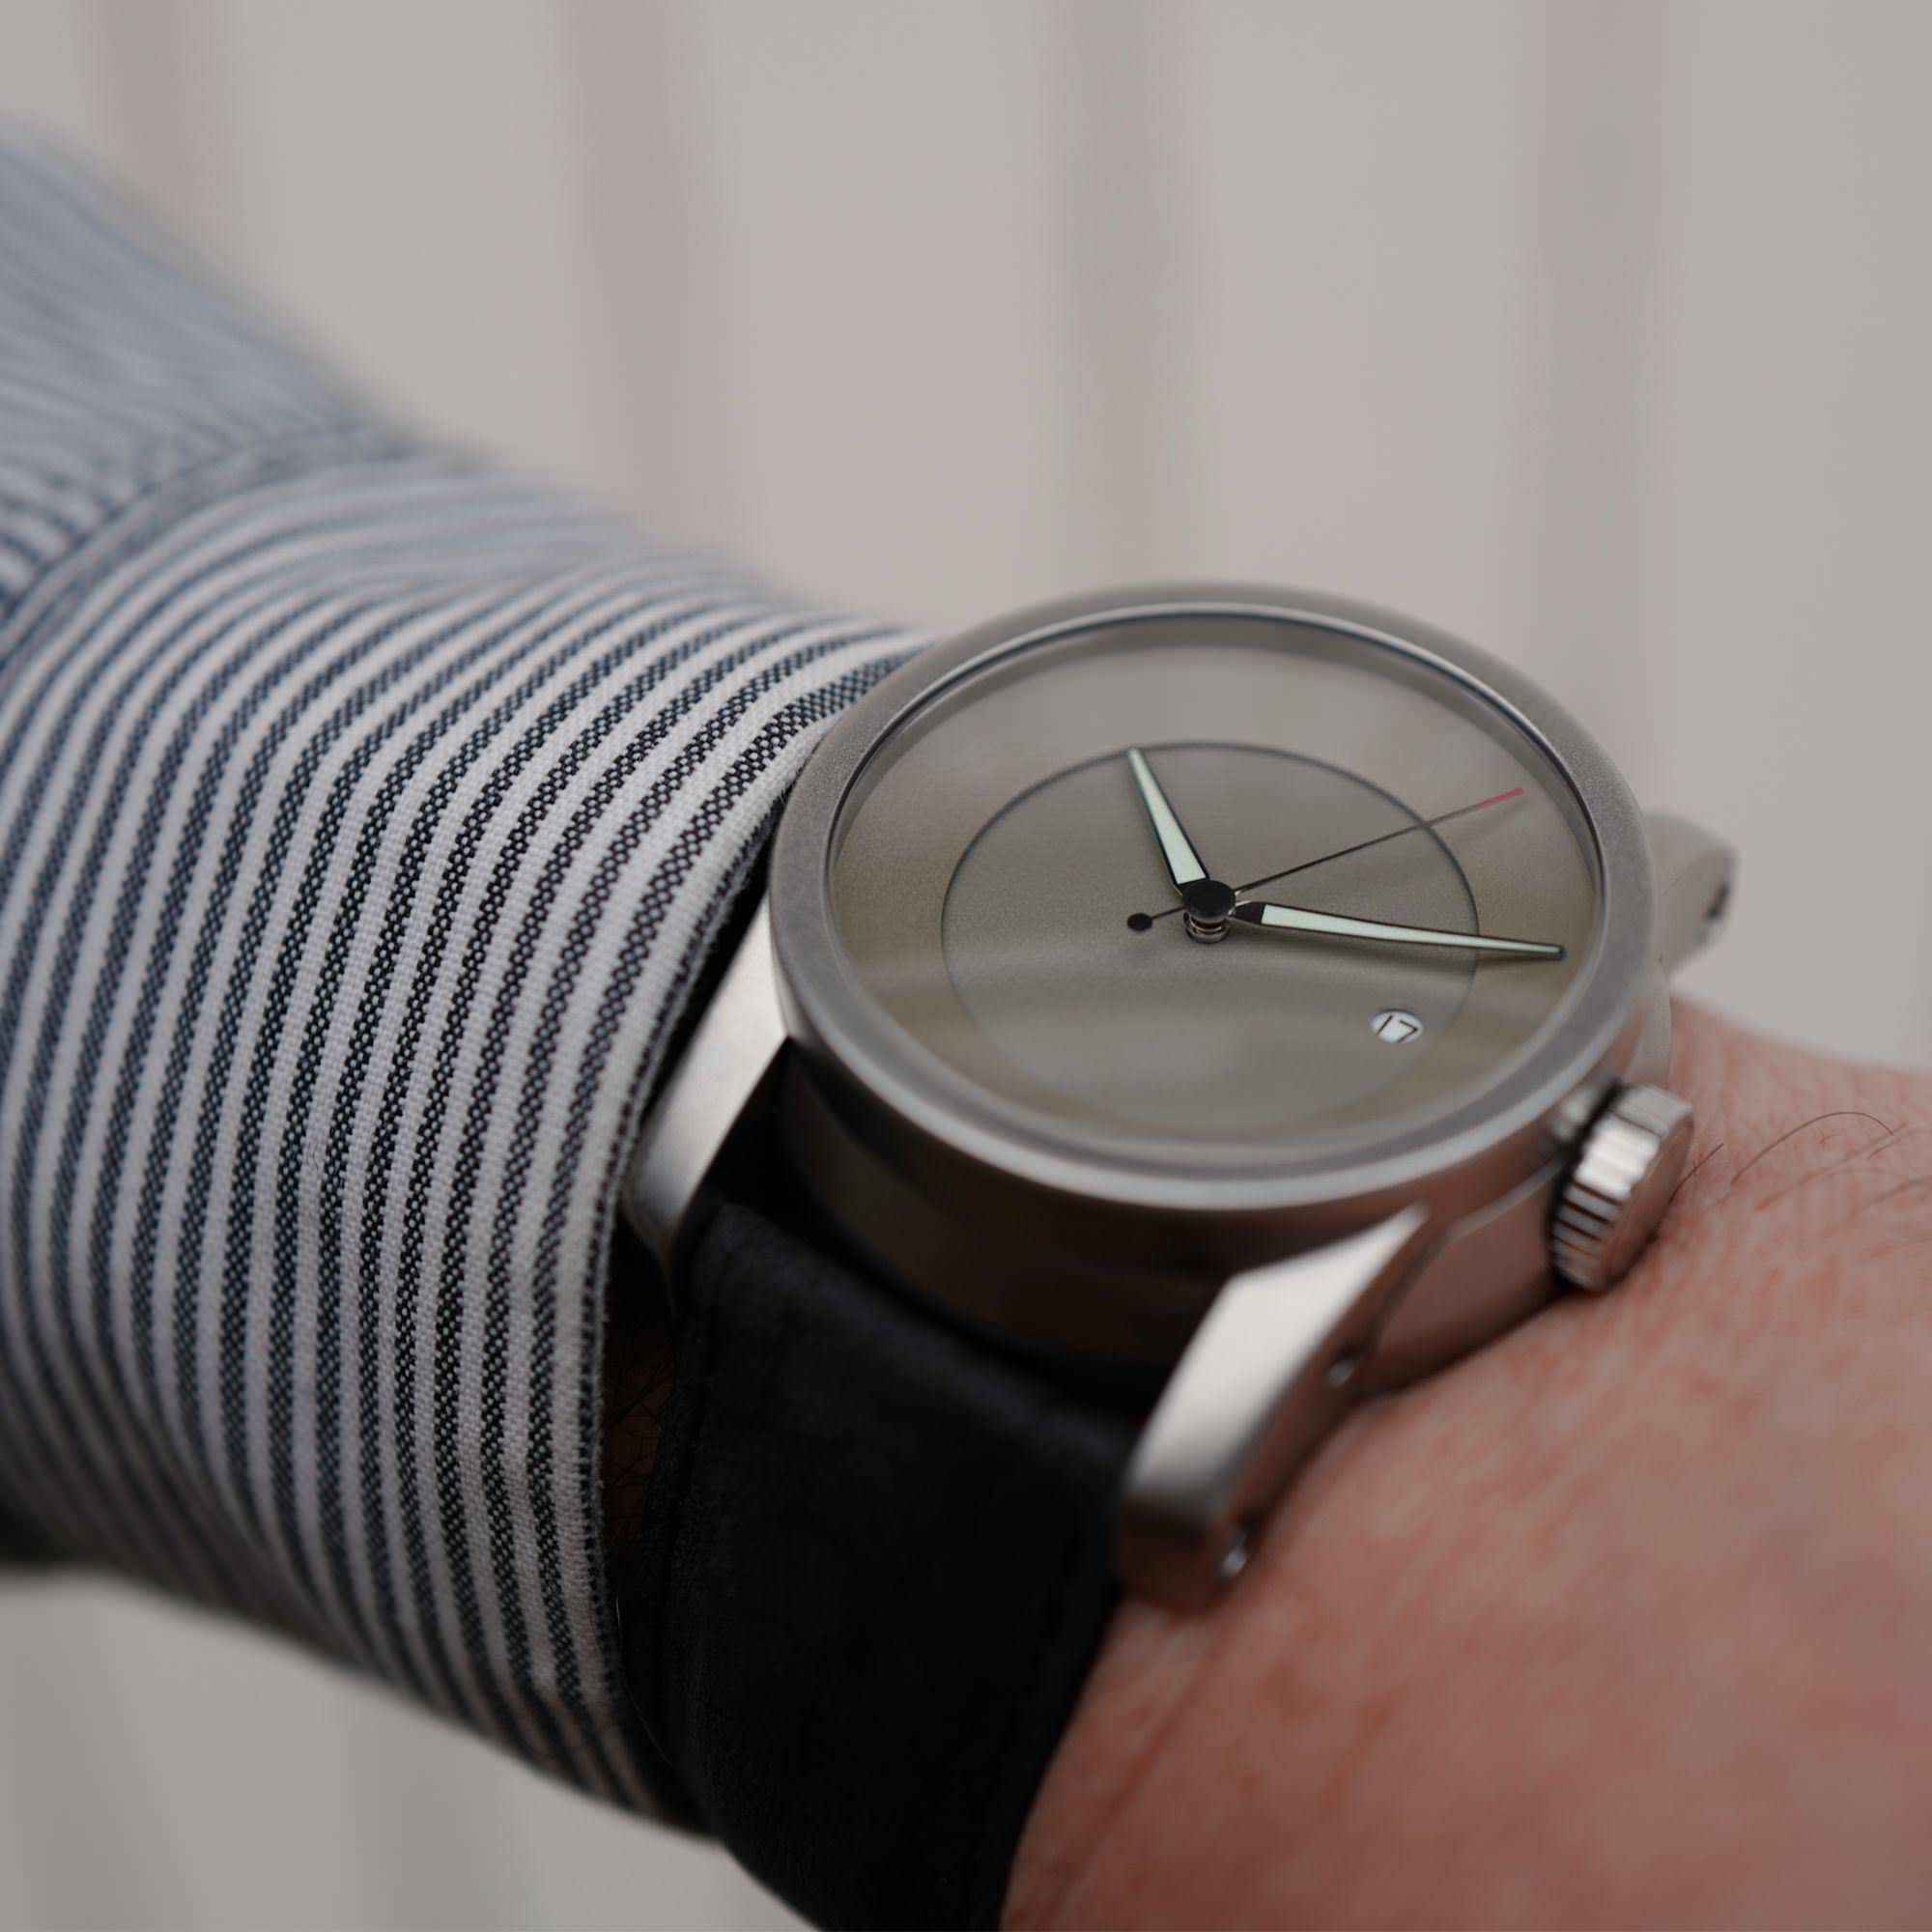 German Silver on the wrist